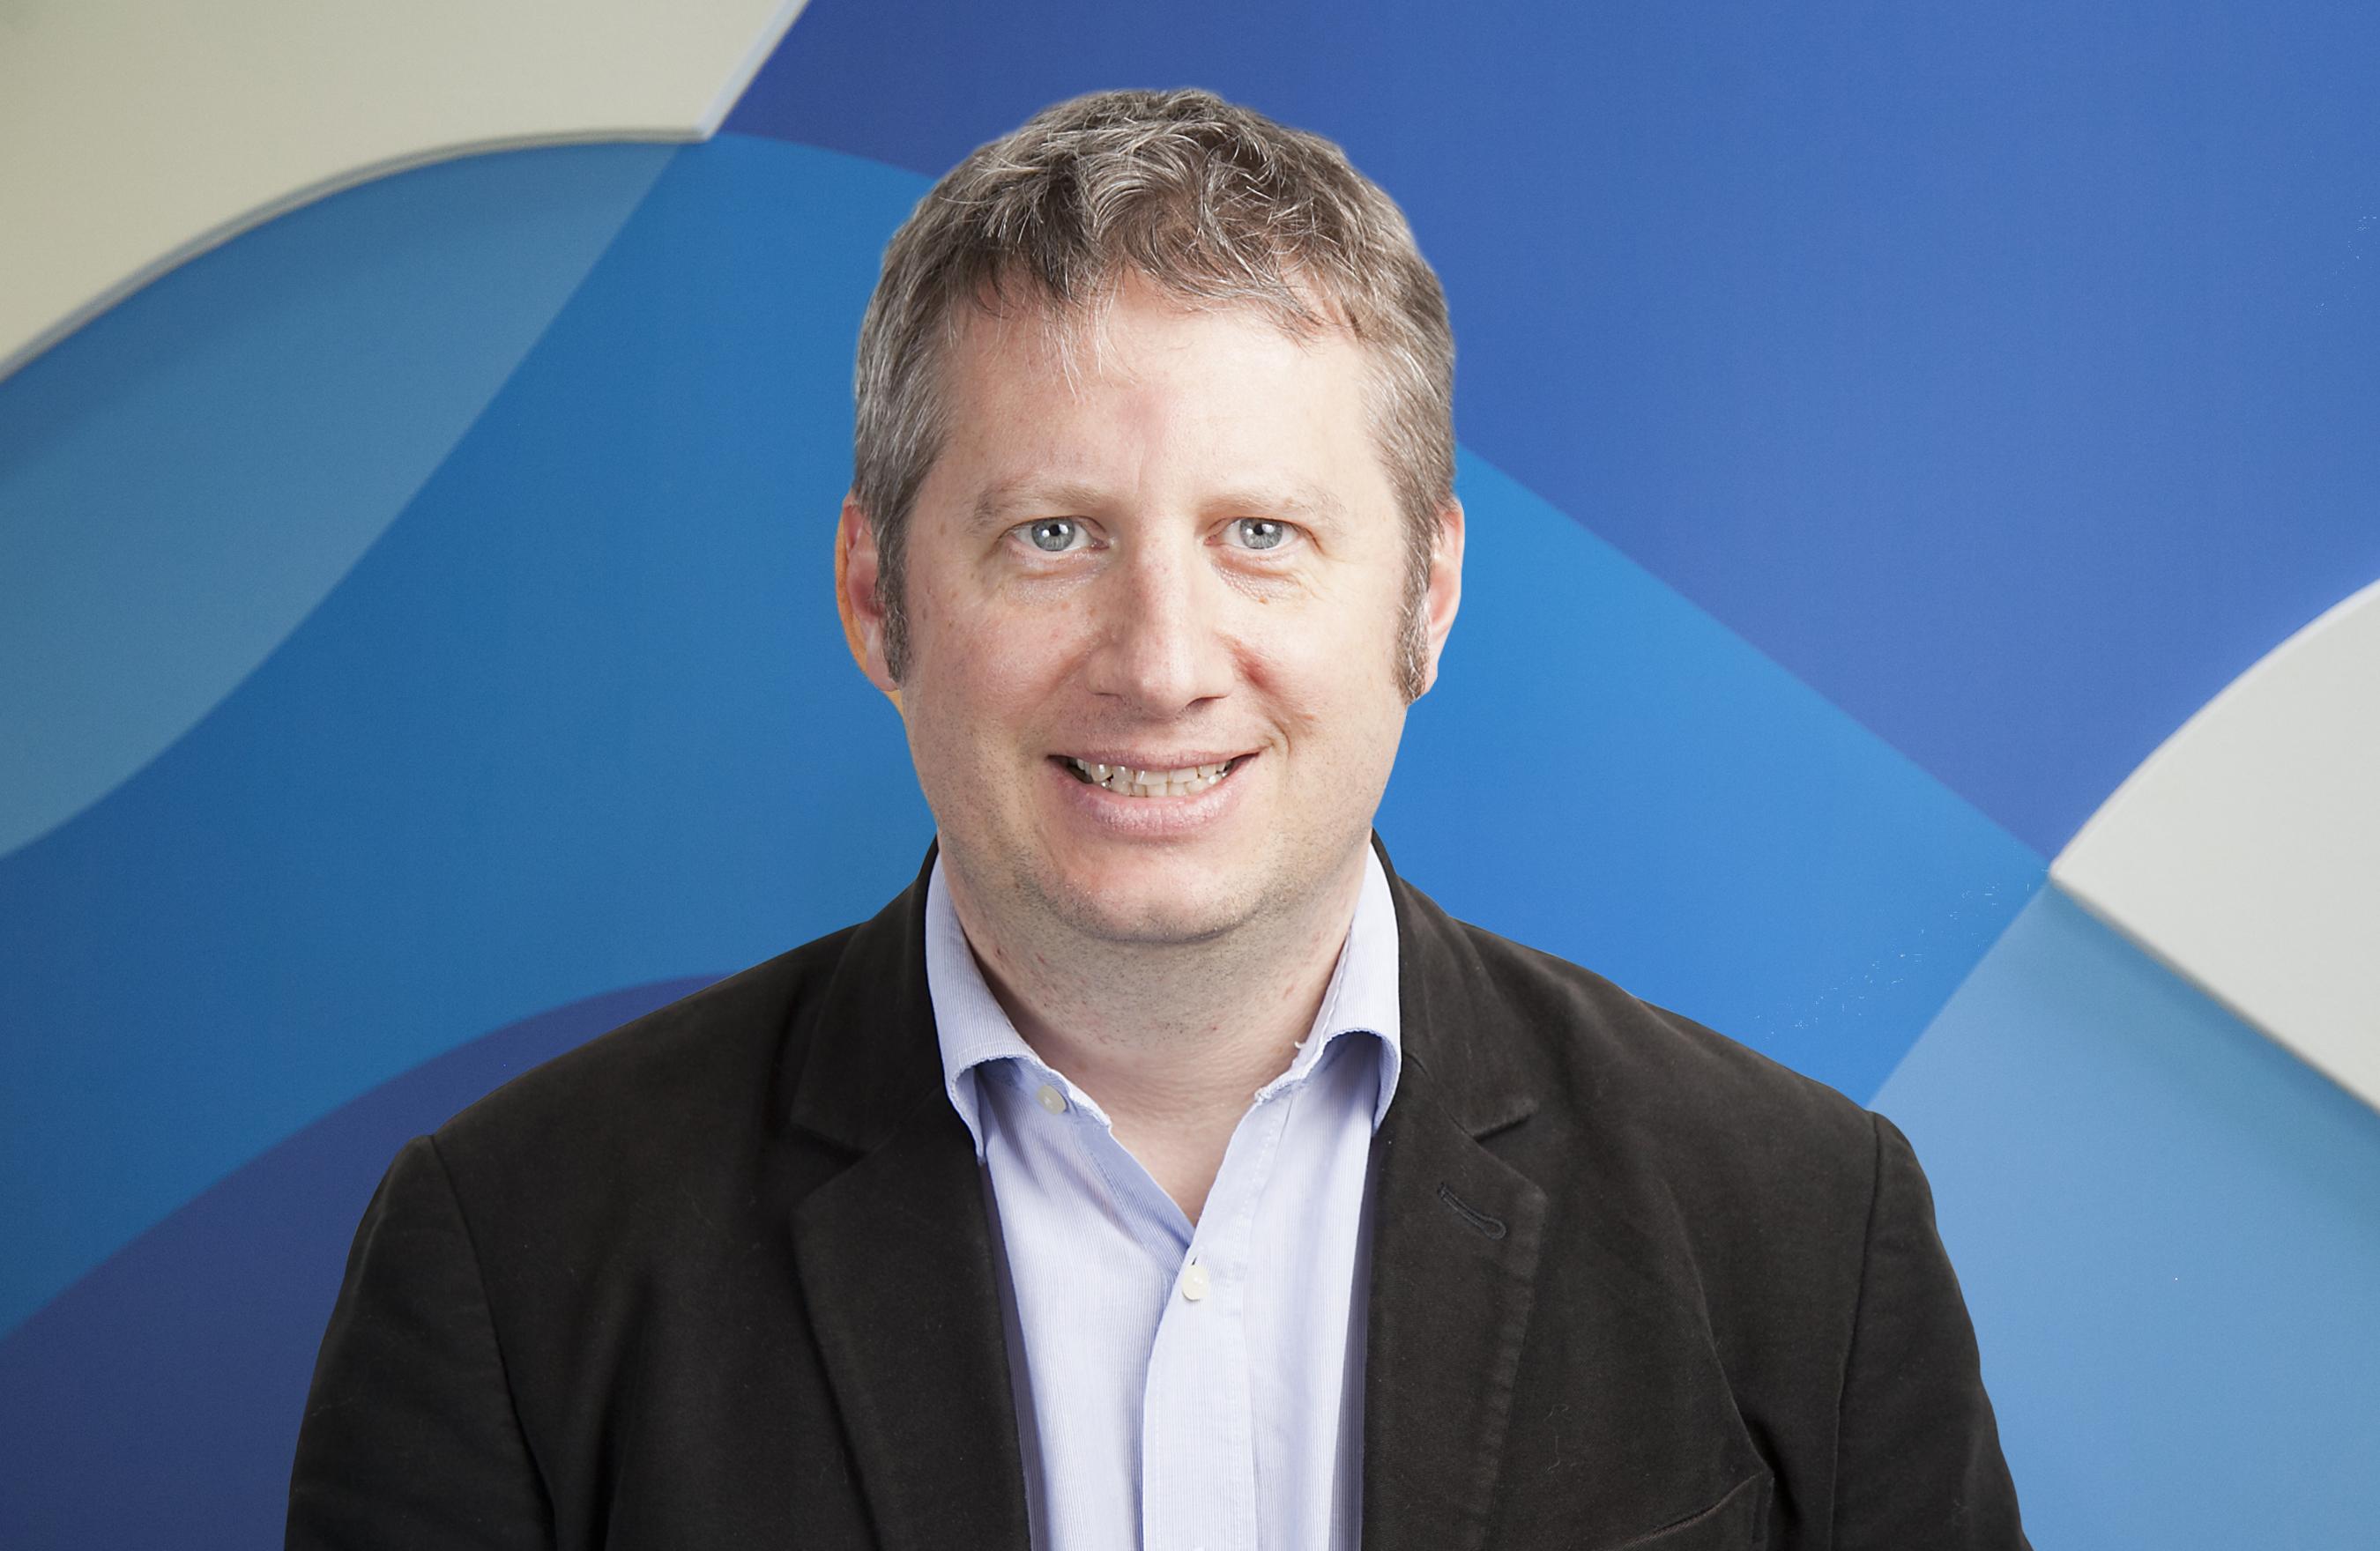 Ben-Roberts Empowering Generation Z through technology